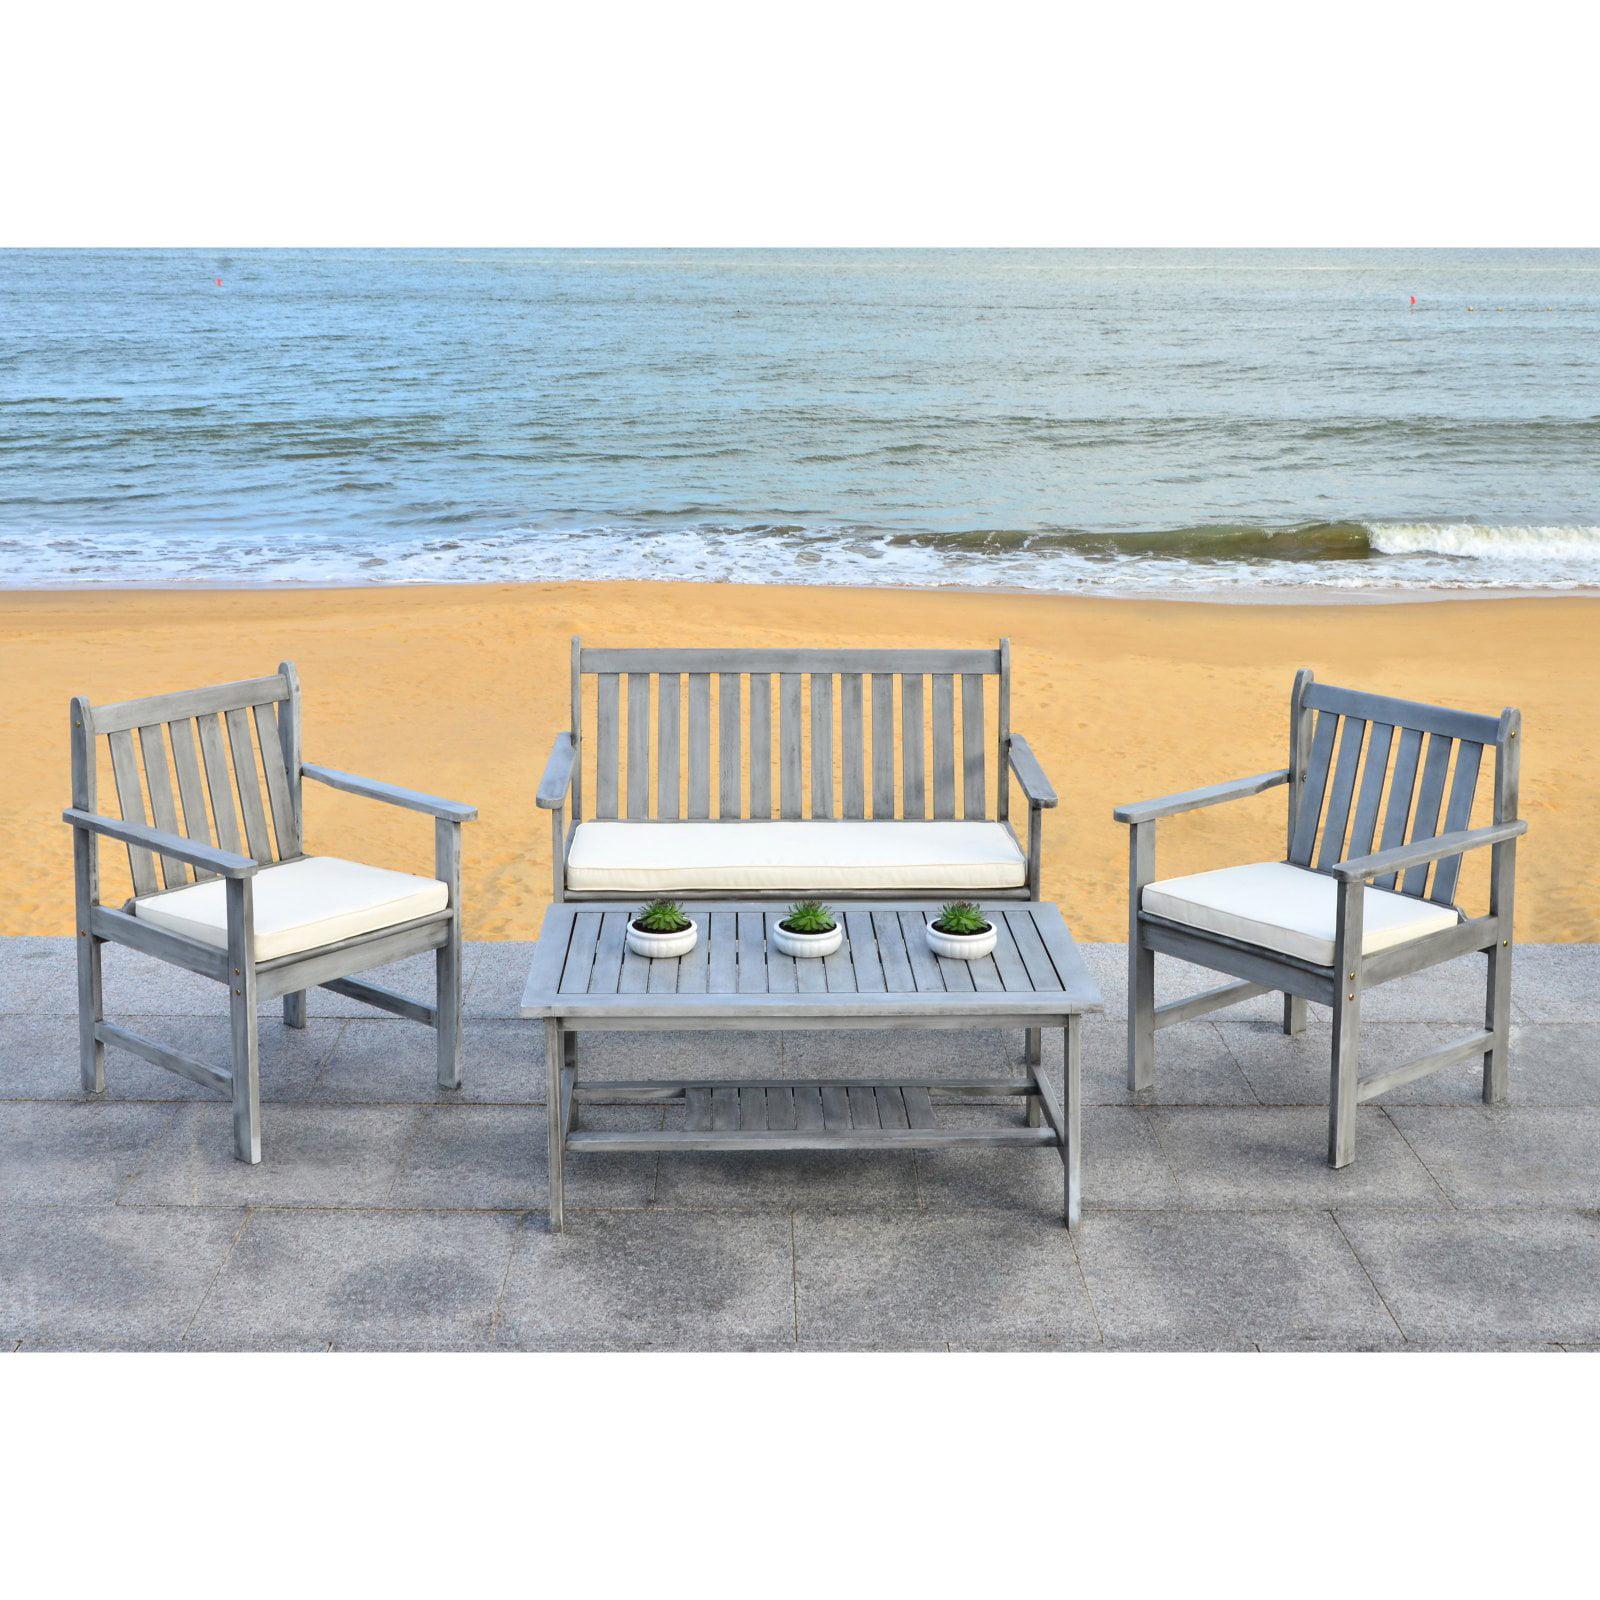 Safavieh Burbank Outdoor Contemporary 4 Piece Living Set with Cushion